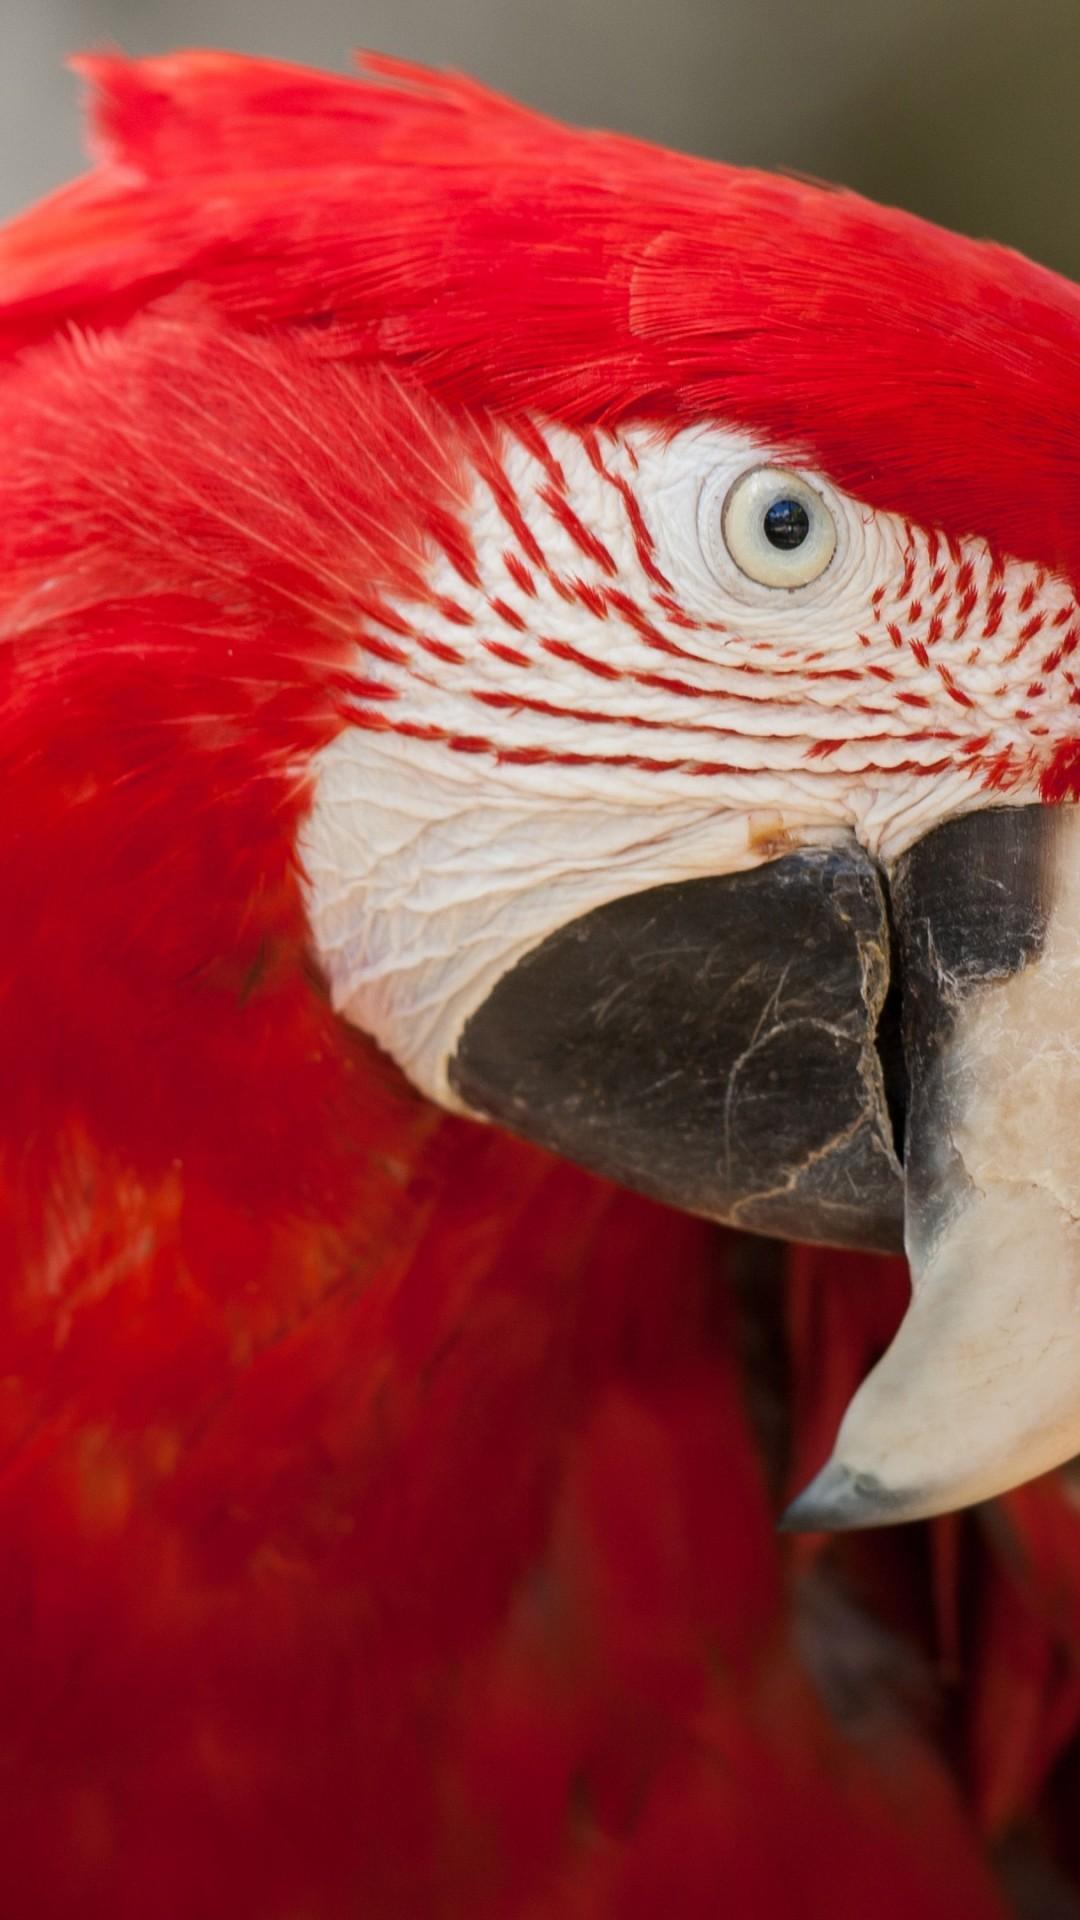 Wallpaper Macaw Parrot Tropical Bird Red Animals 12484